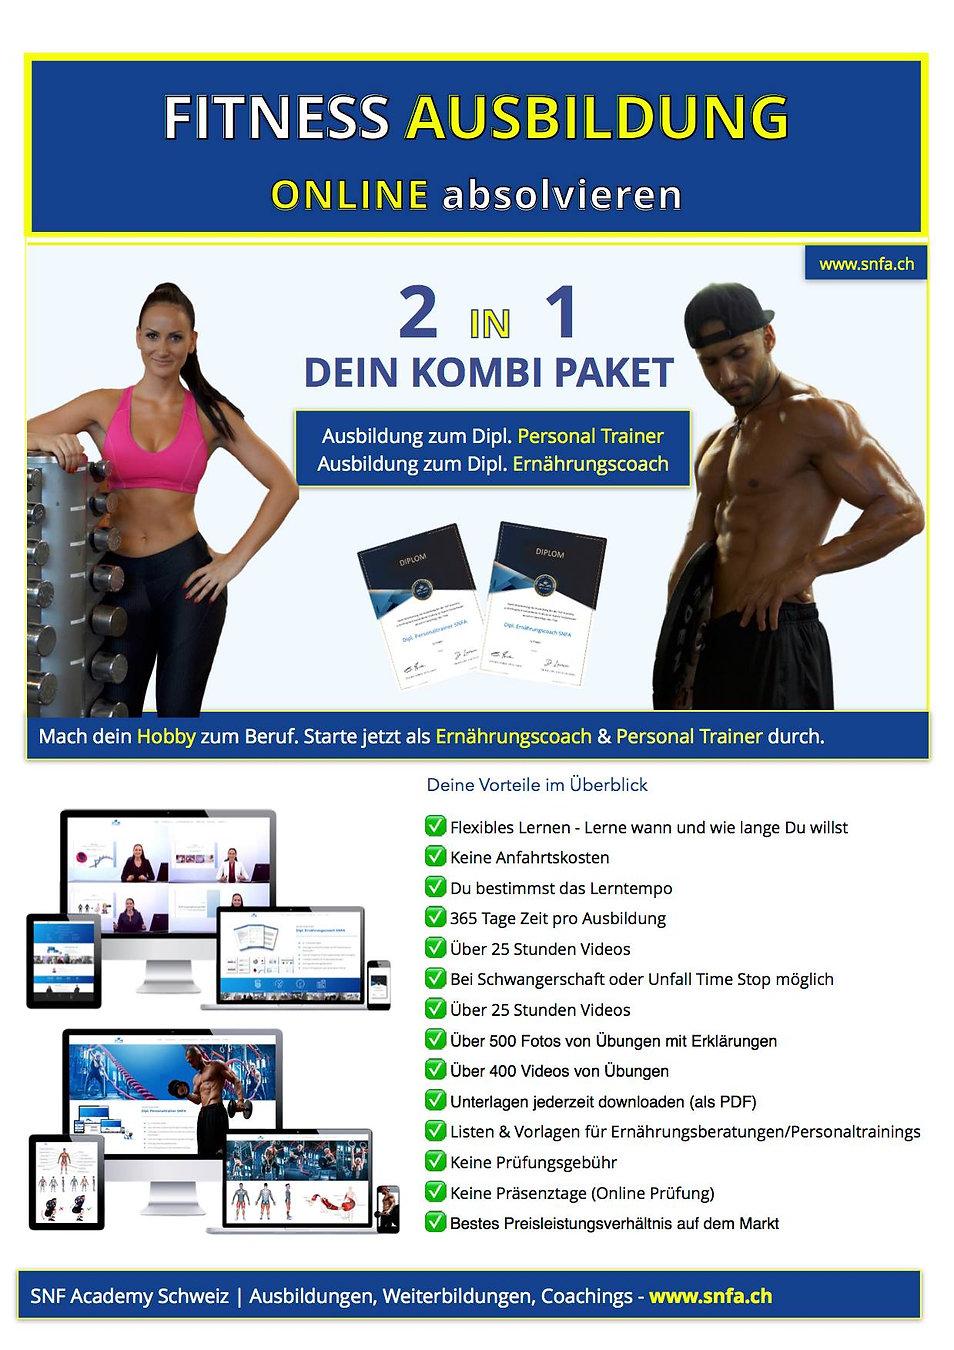 fitness ausbildung online schweiz.jpg